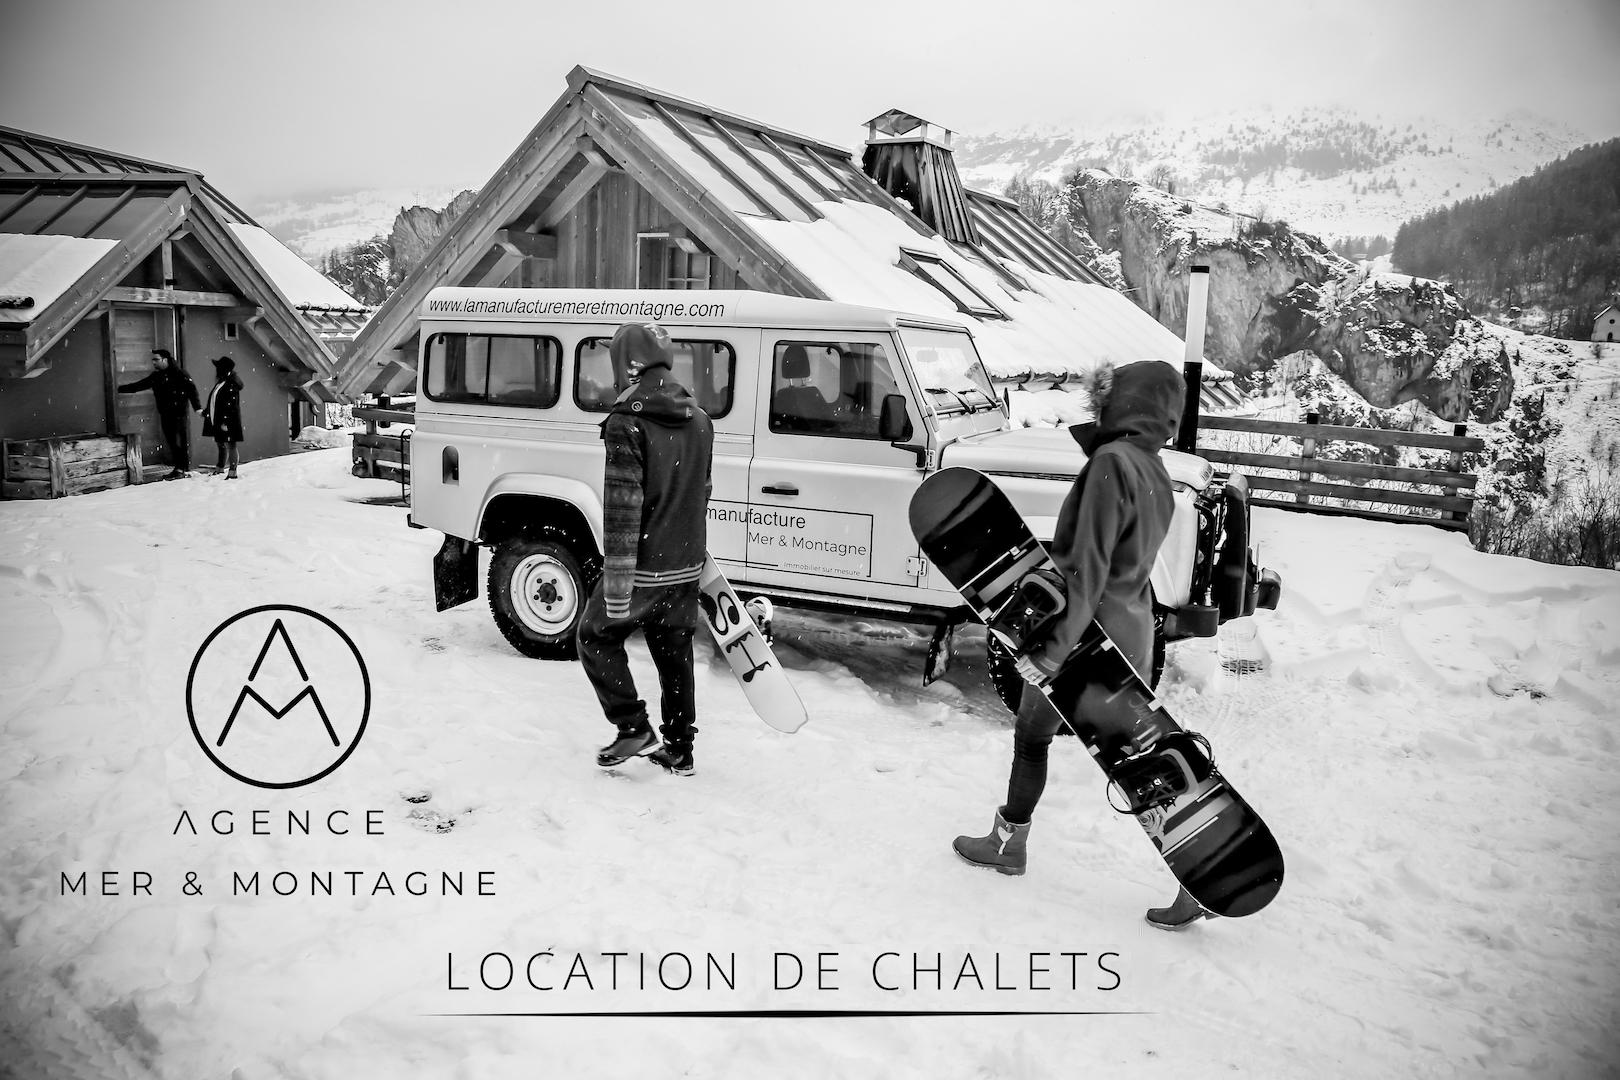 Agence Mer & Montagne - Location / Vente / Conciergerie de Chalets & Appartements © Agence Mer & Montagne